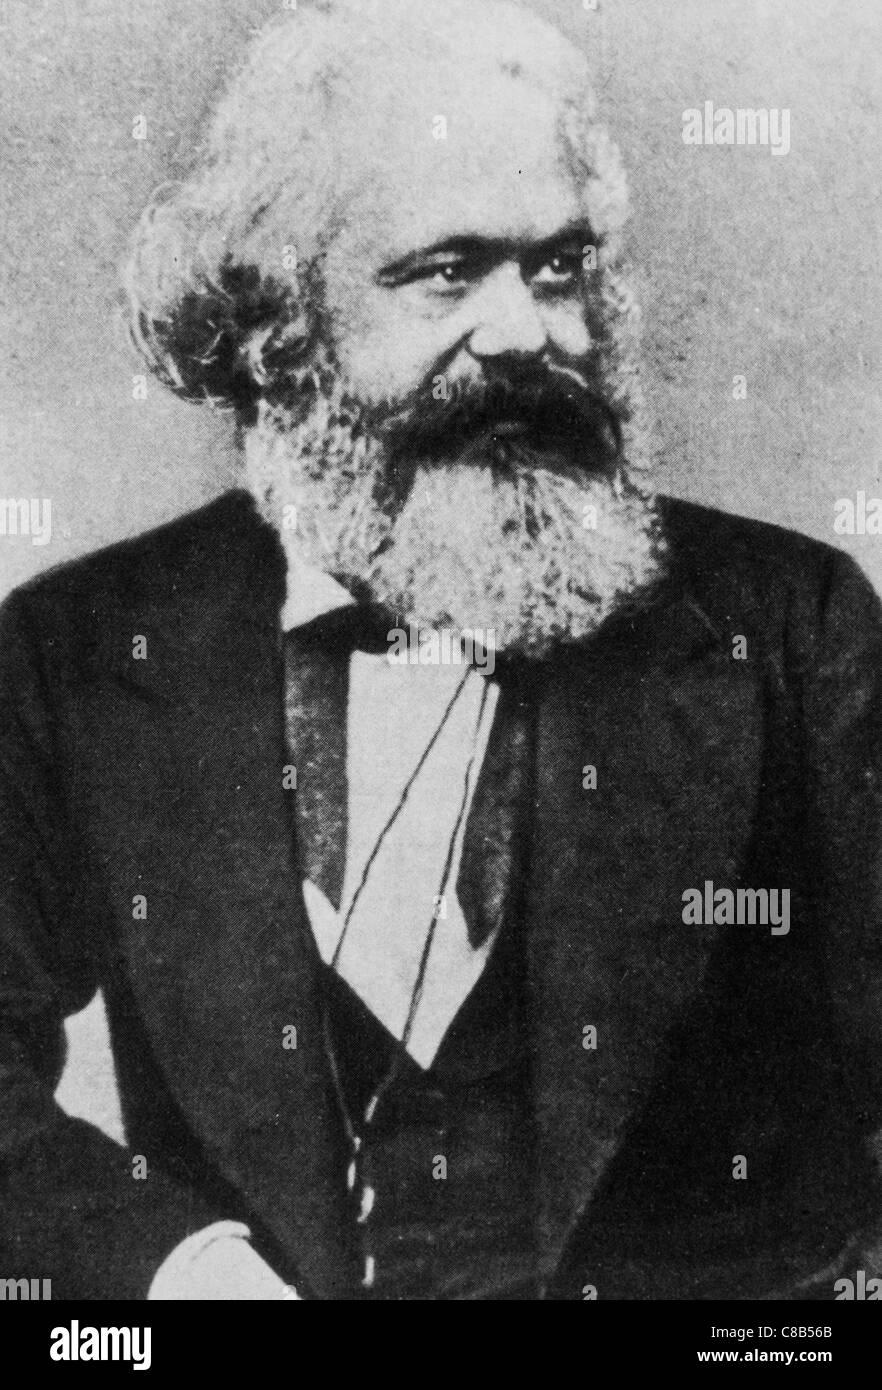 Karl Heinrich Marx - Stock Image